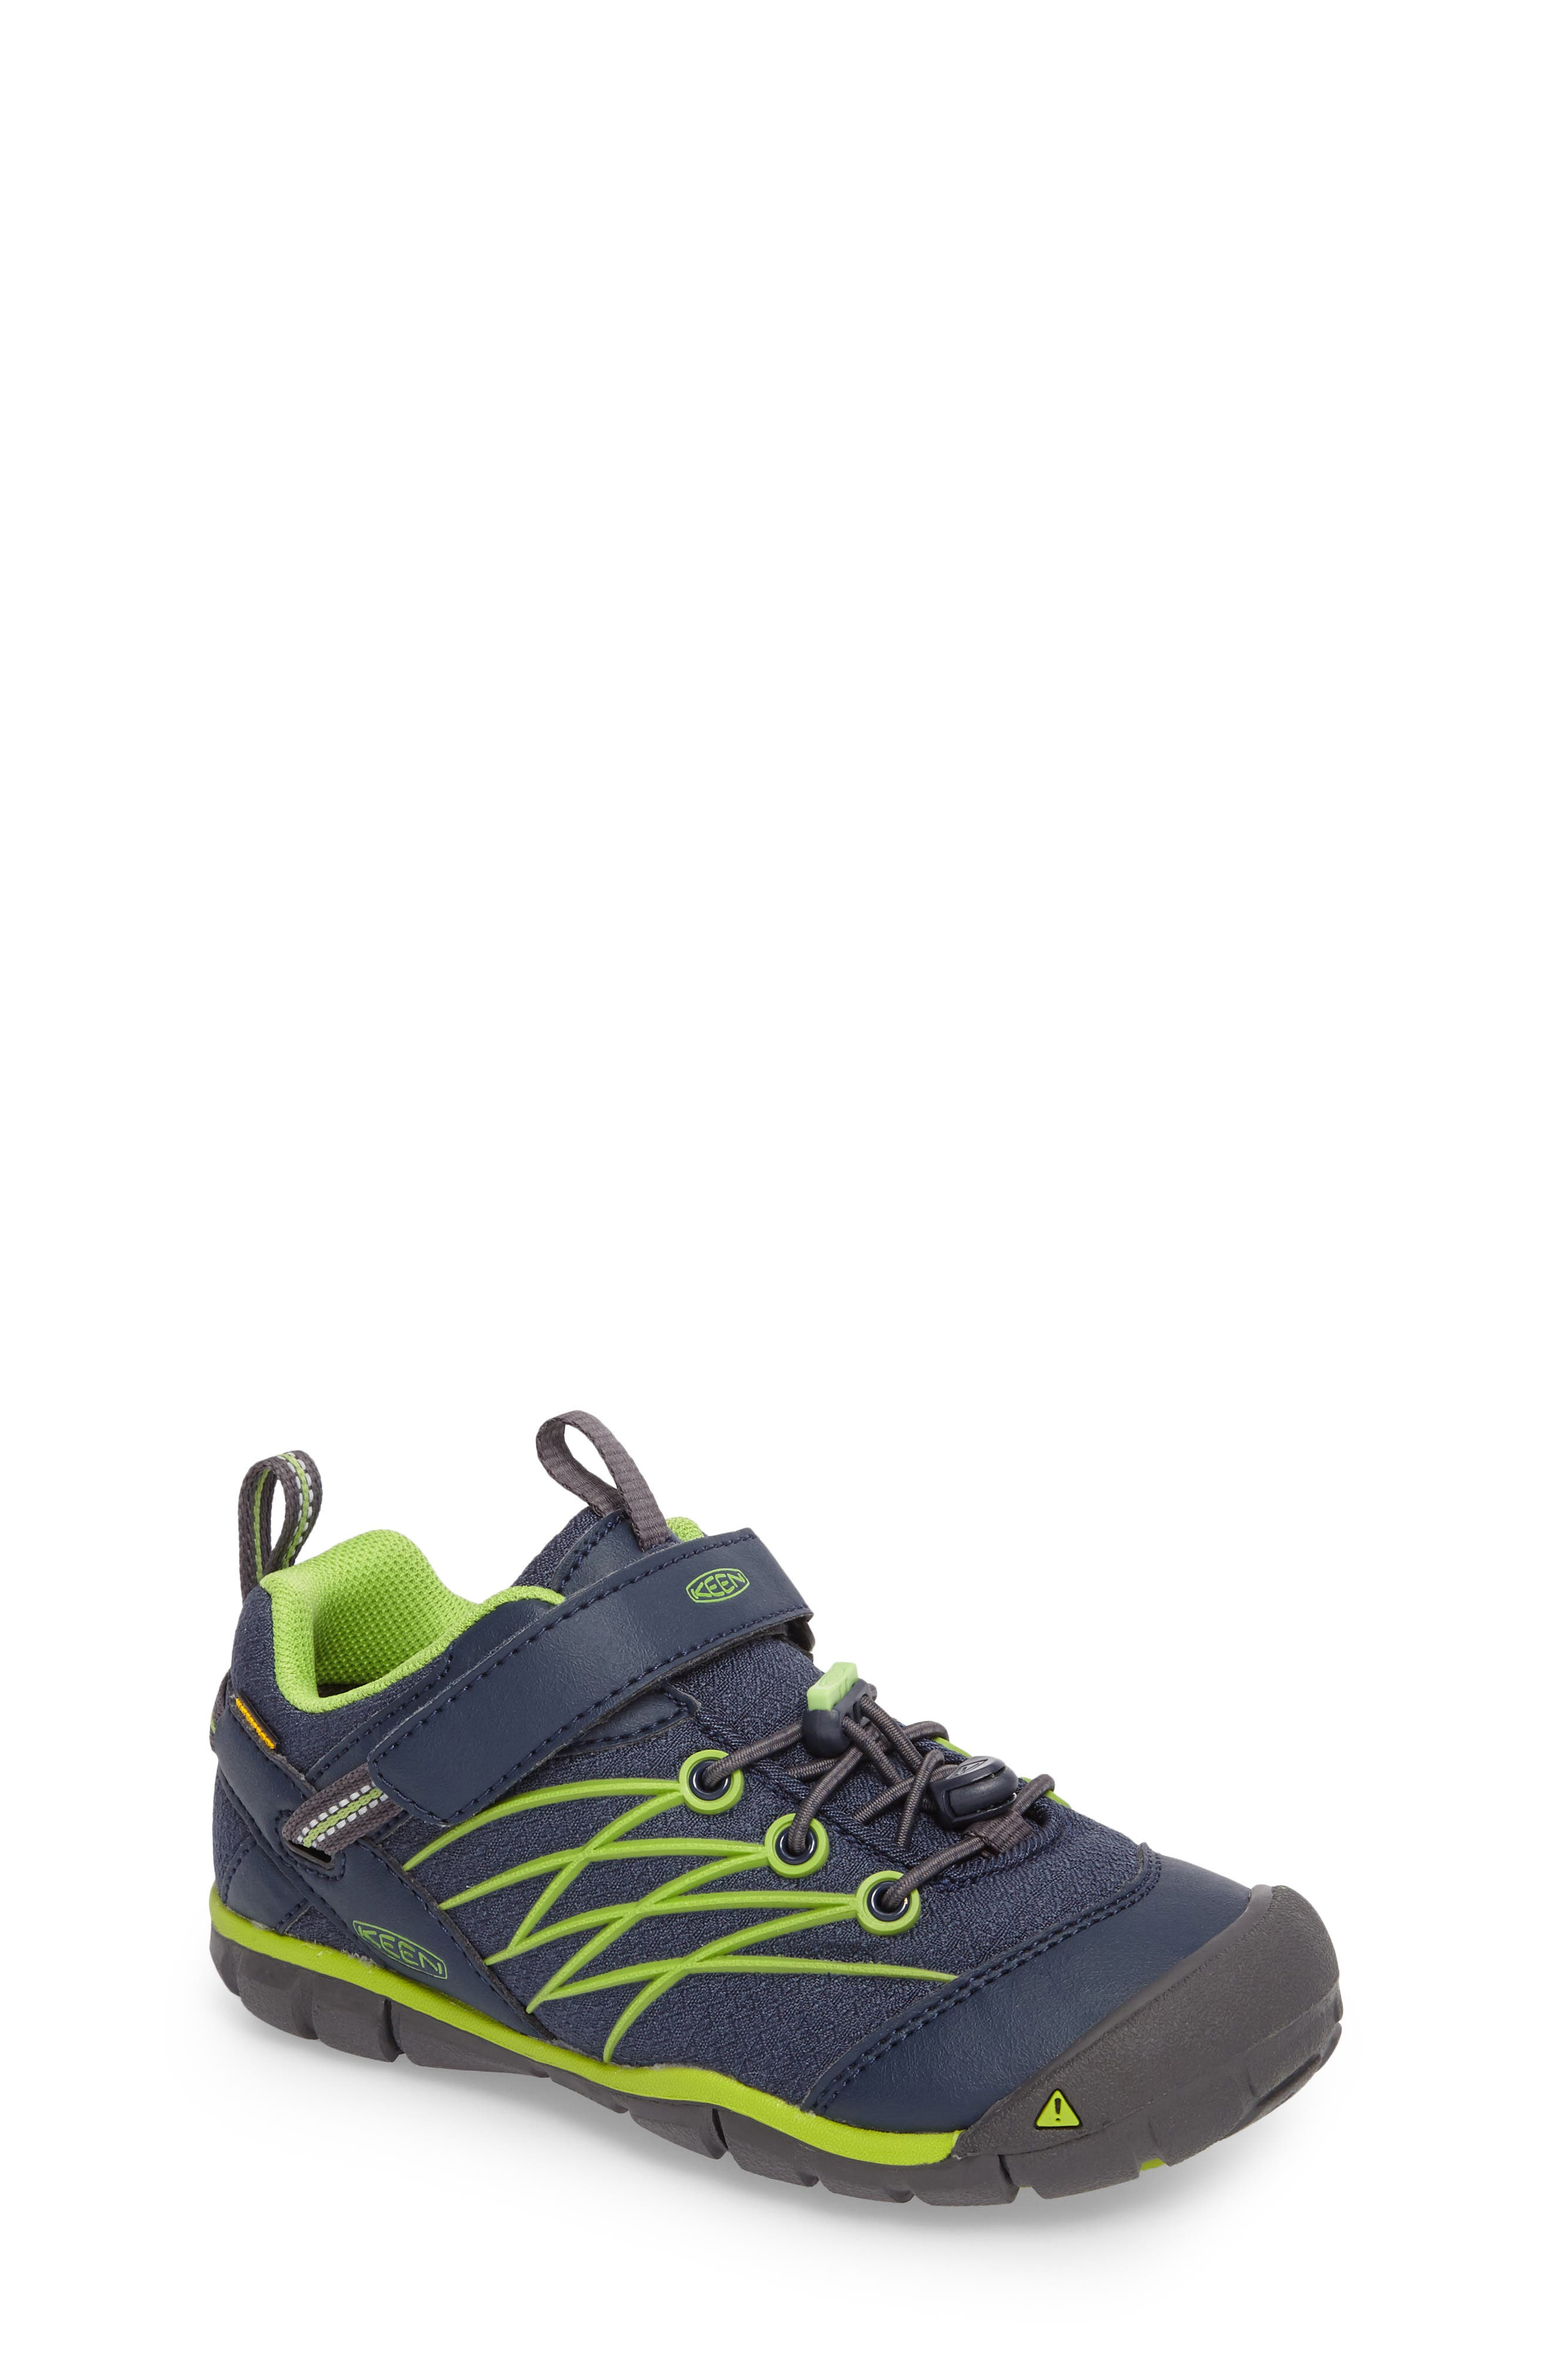 Chandler CNX Waterproof Sneaker,                         Main,                         color, Dress Blues/ Greenery